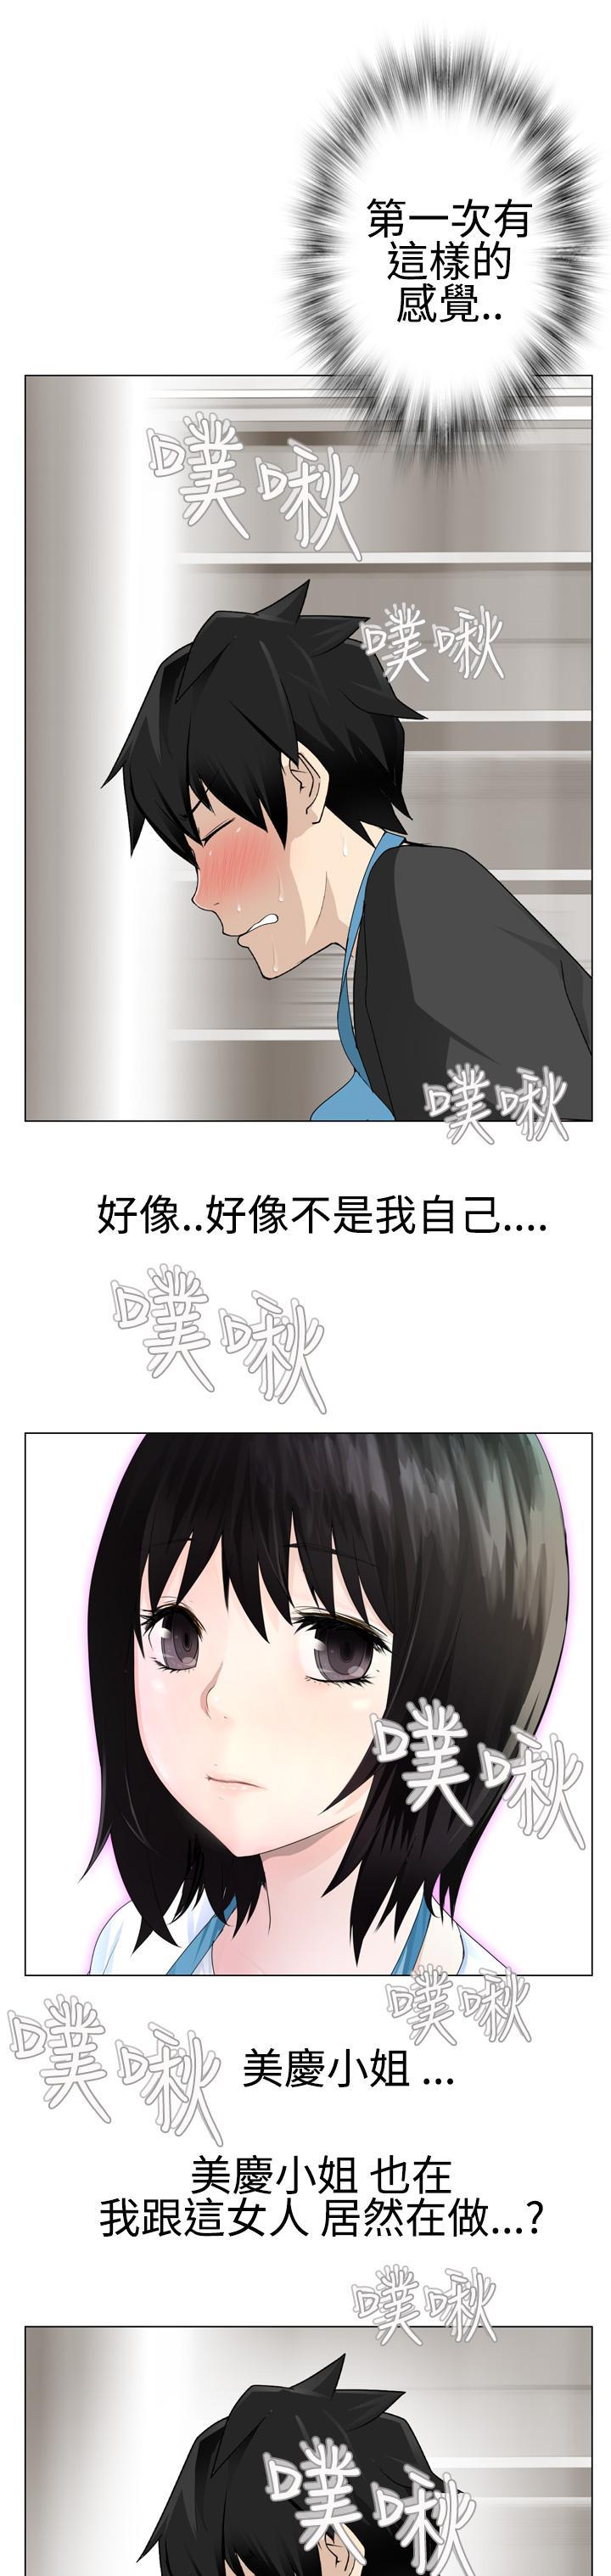 [SOSO] Franken Jo 为爱而生 法兰克赵 Ch.1~19 [Chinese]中文 271